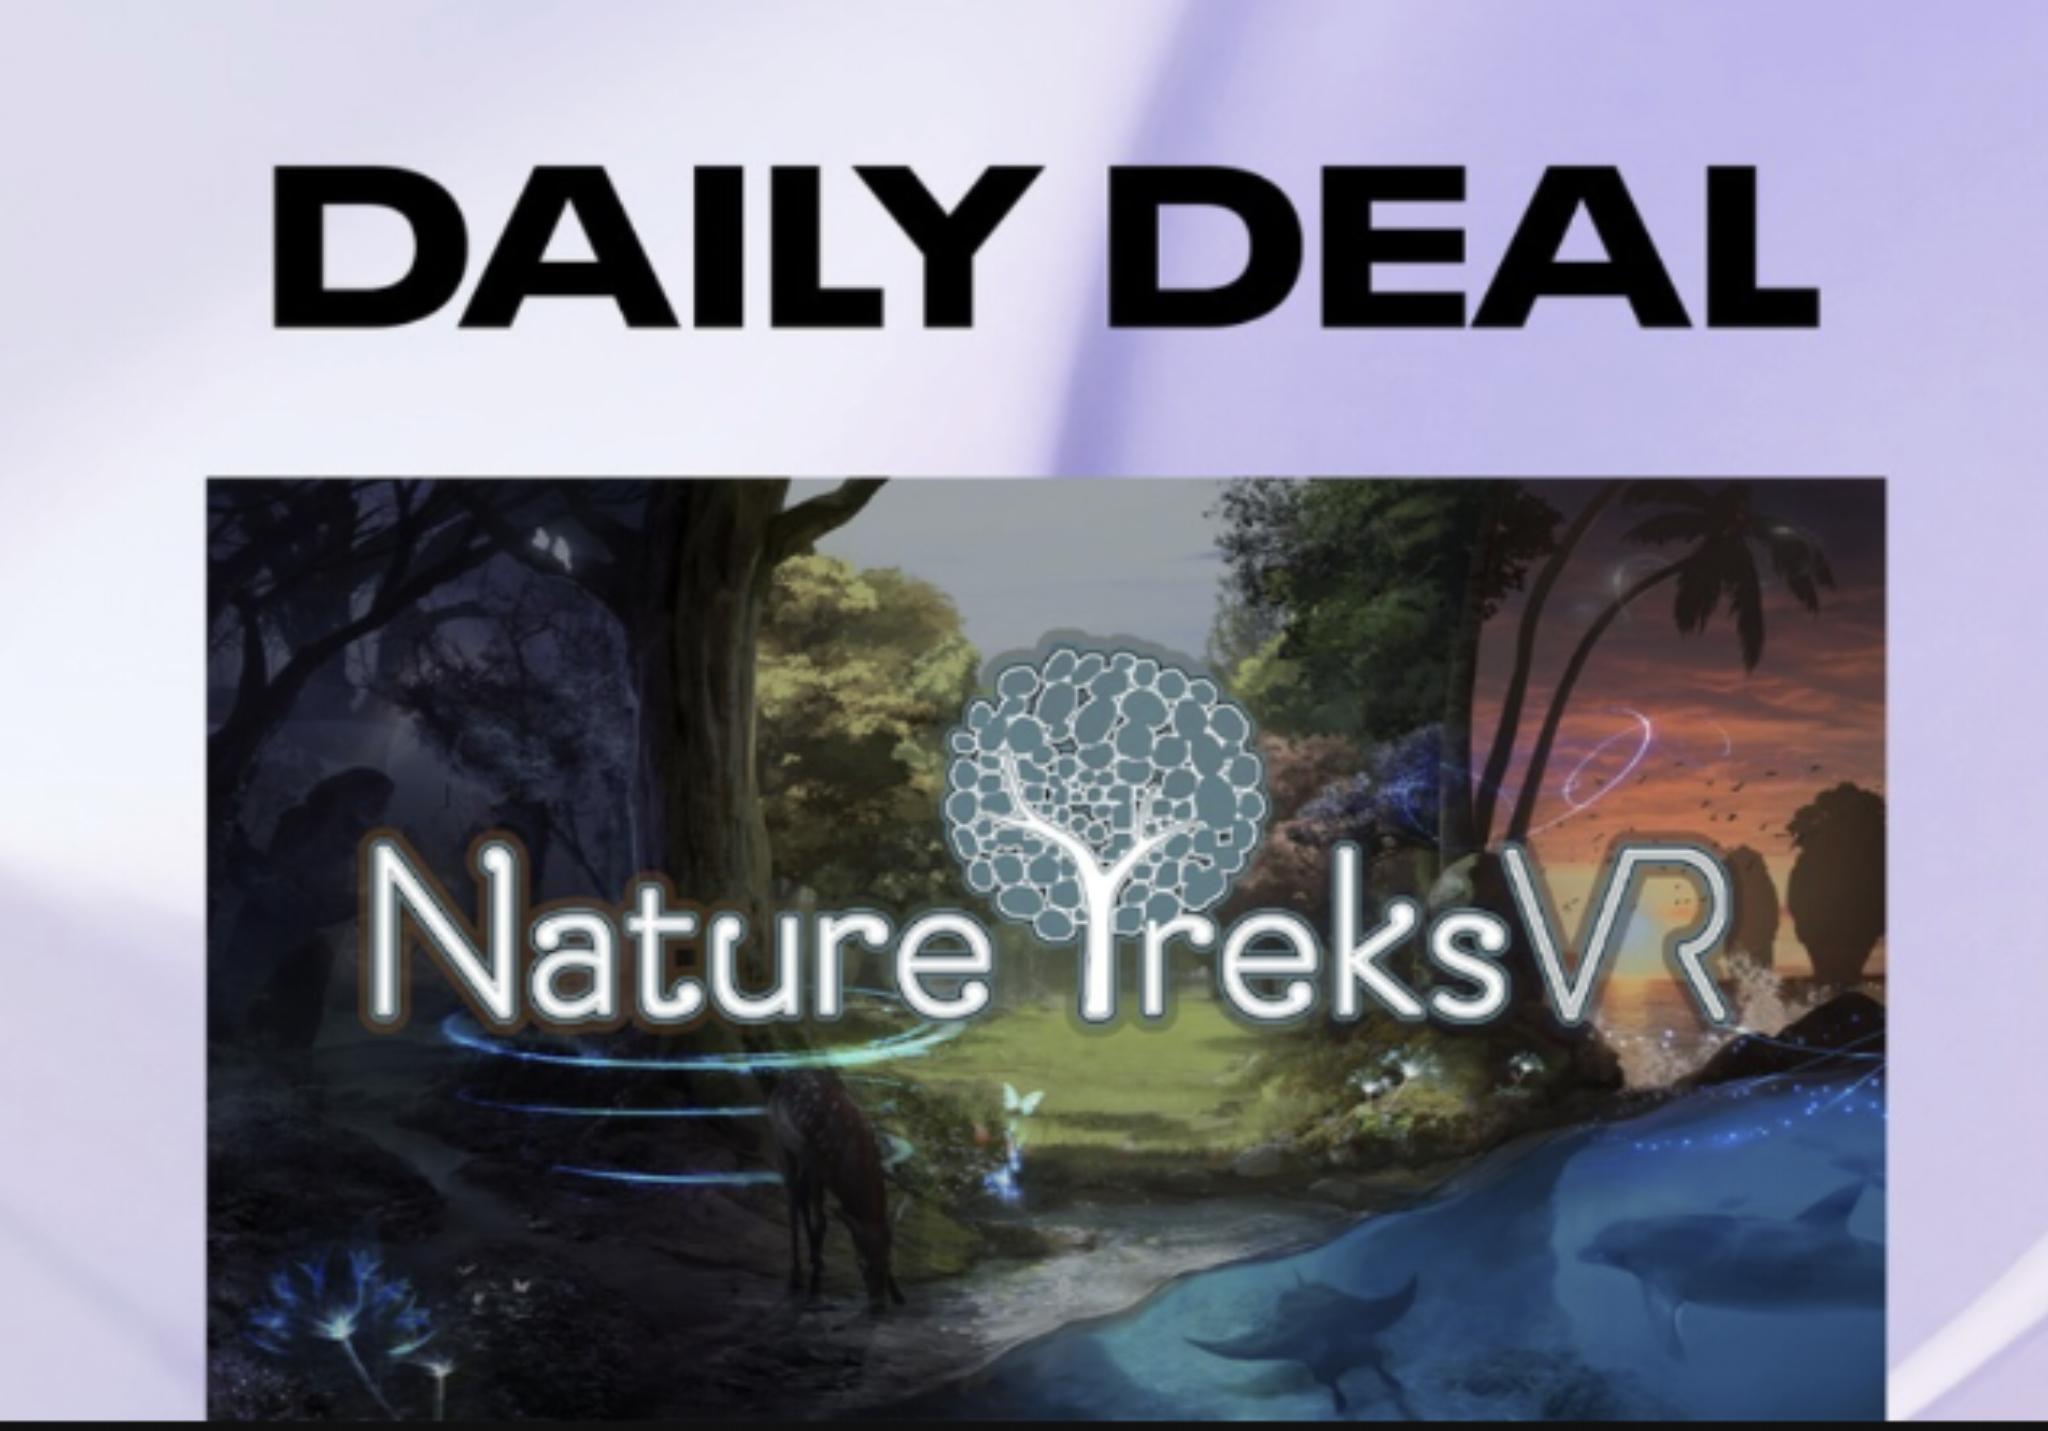 Oculus Quest VR Daily Deal - Nature Treks VR £5.99 @ Oculus